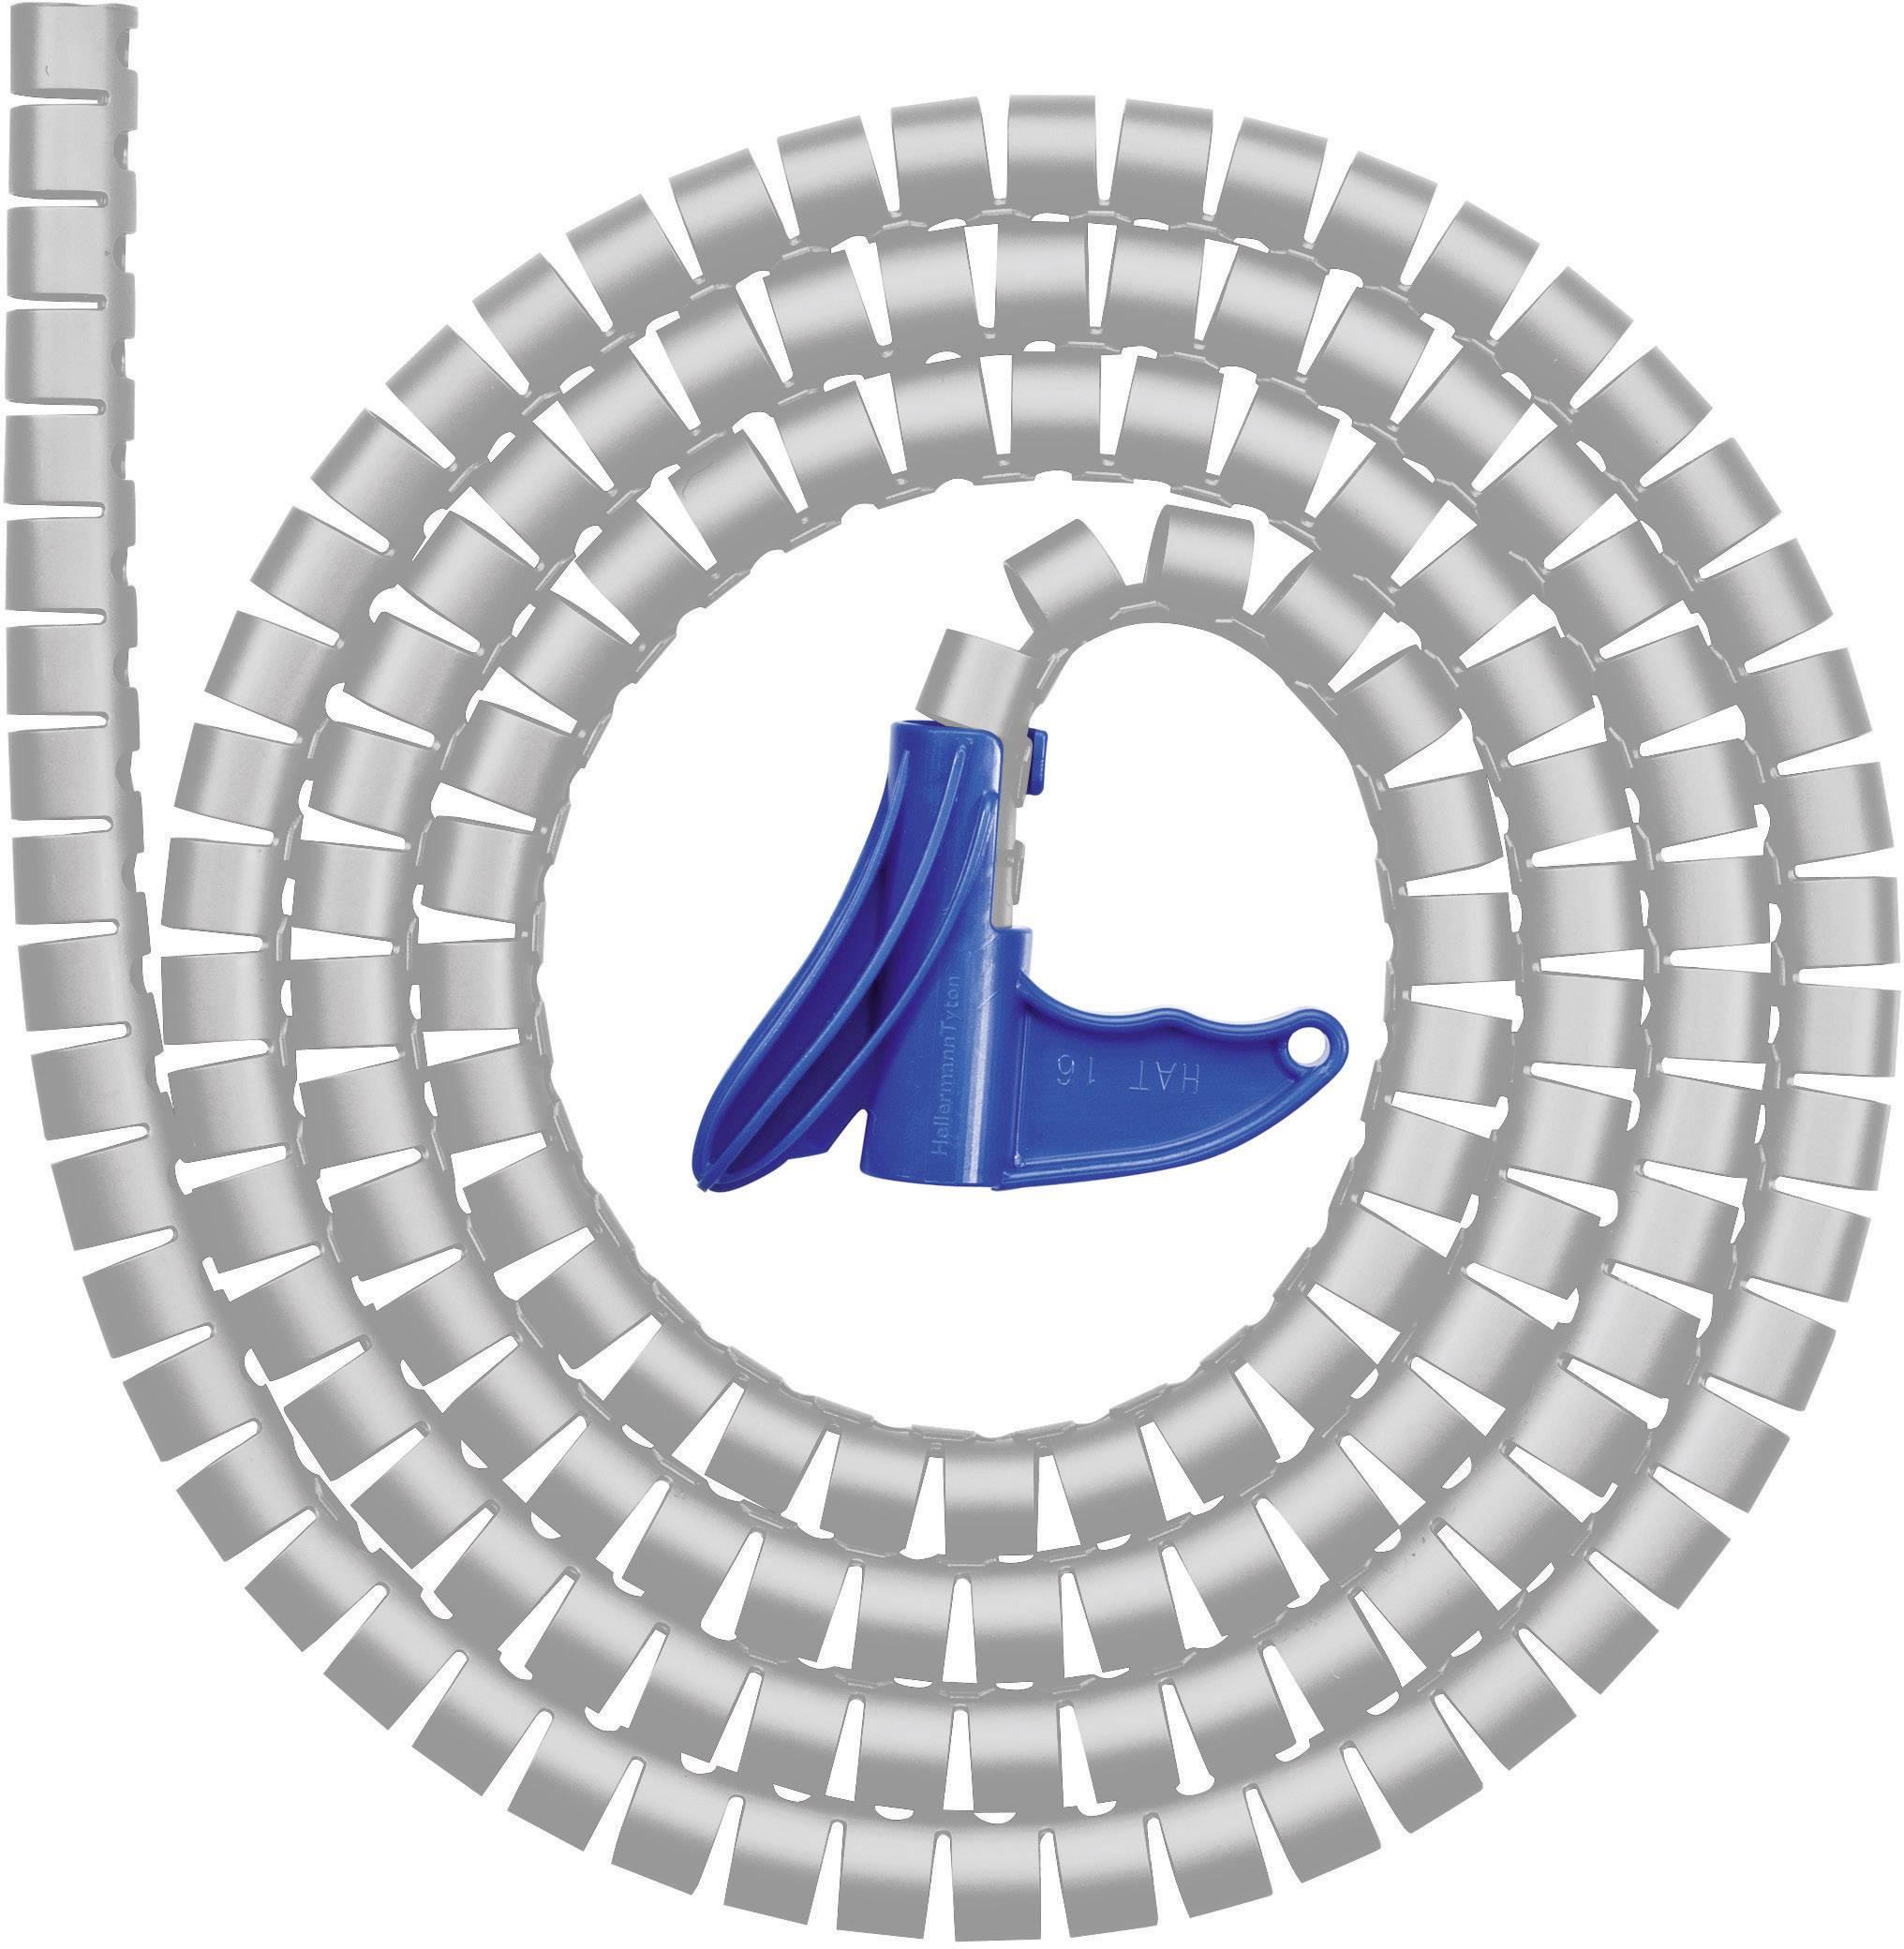 Káblový oplet HellermannTyton HWPP-16MM-PP-GY-K1 161-64205, 16 mm (max), 2 m, sivá